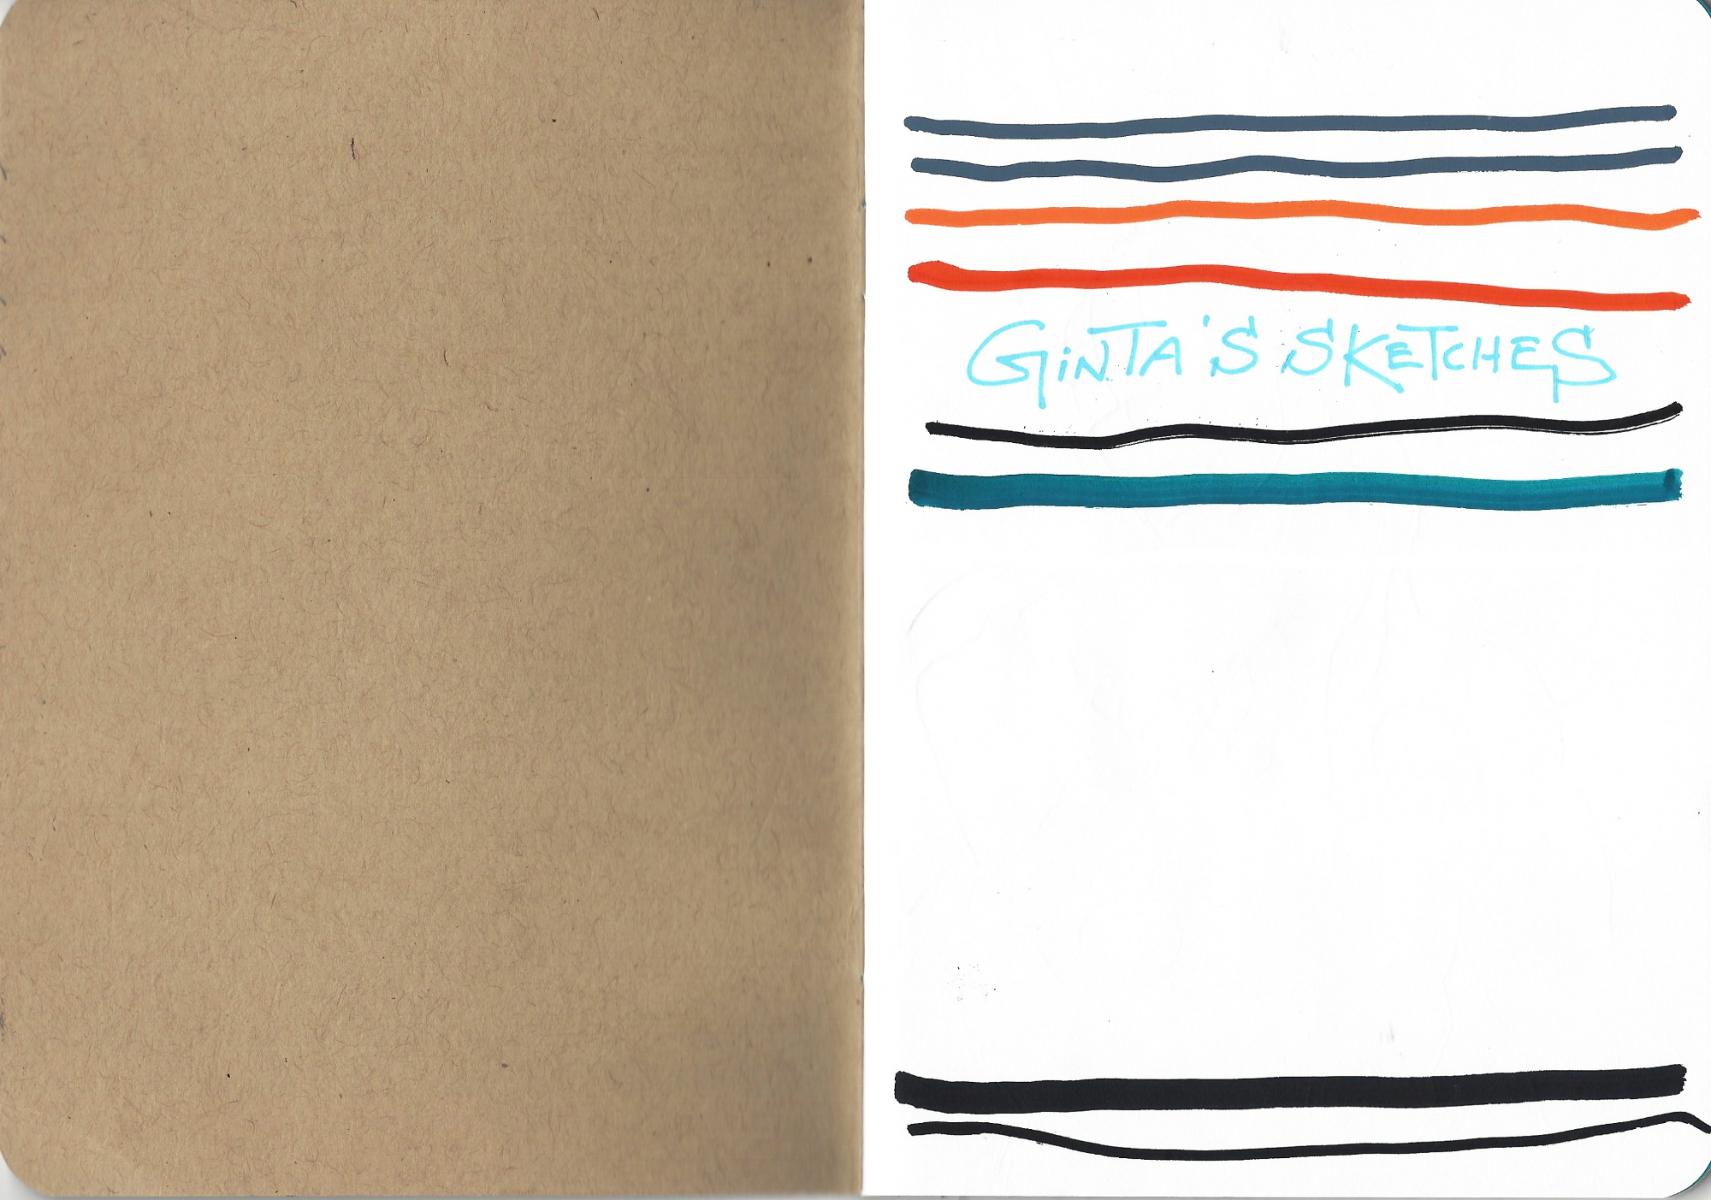 Sketchbookproject-Vol-18-B2772443-1